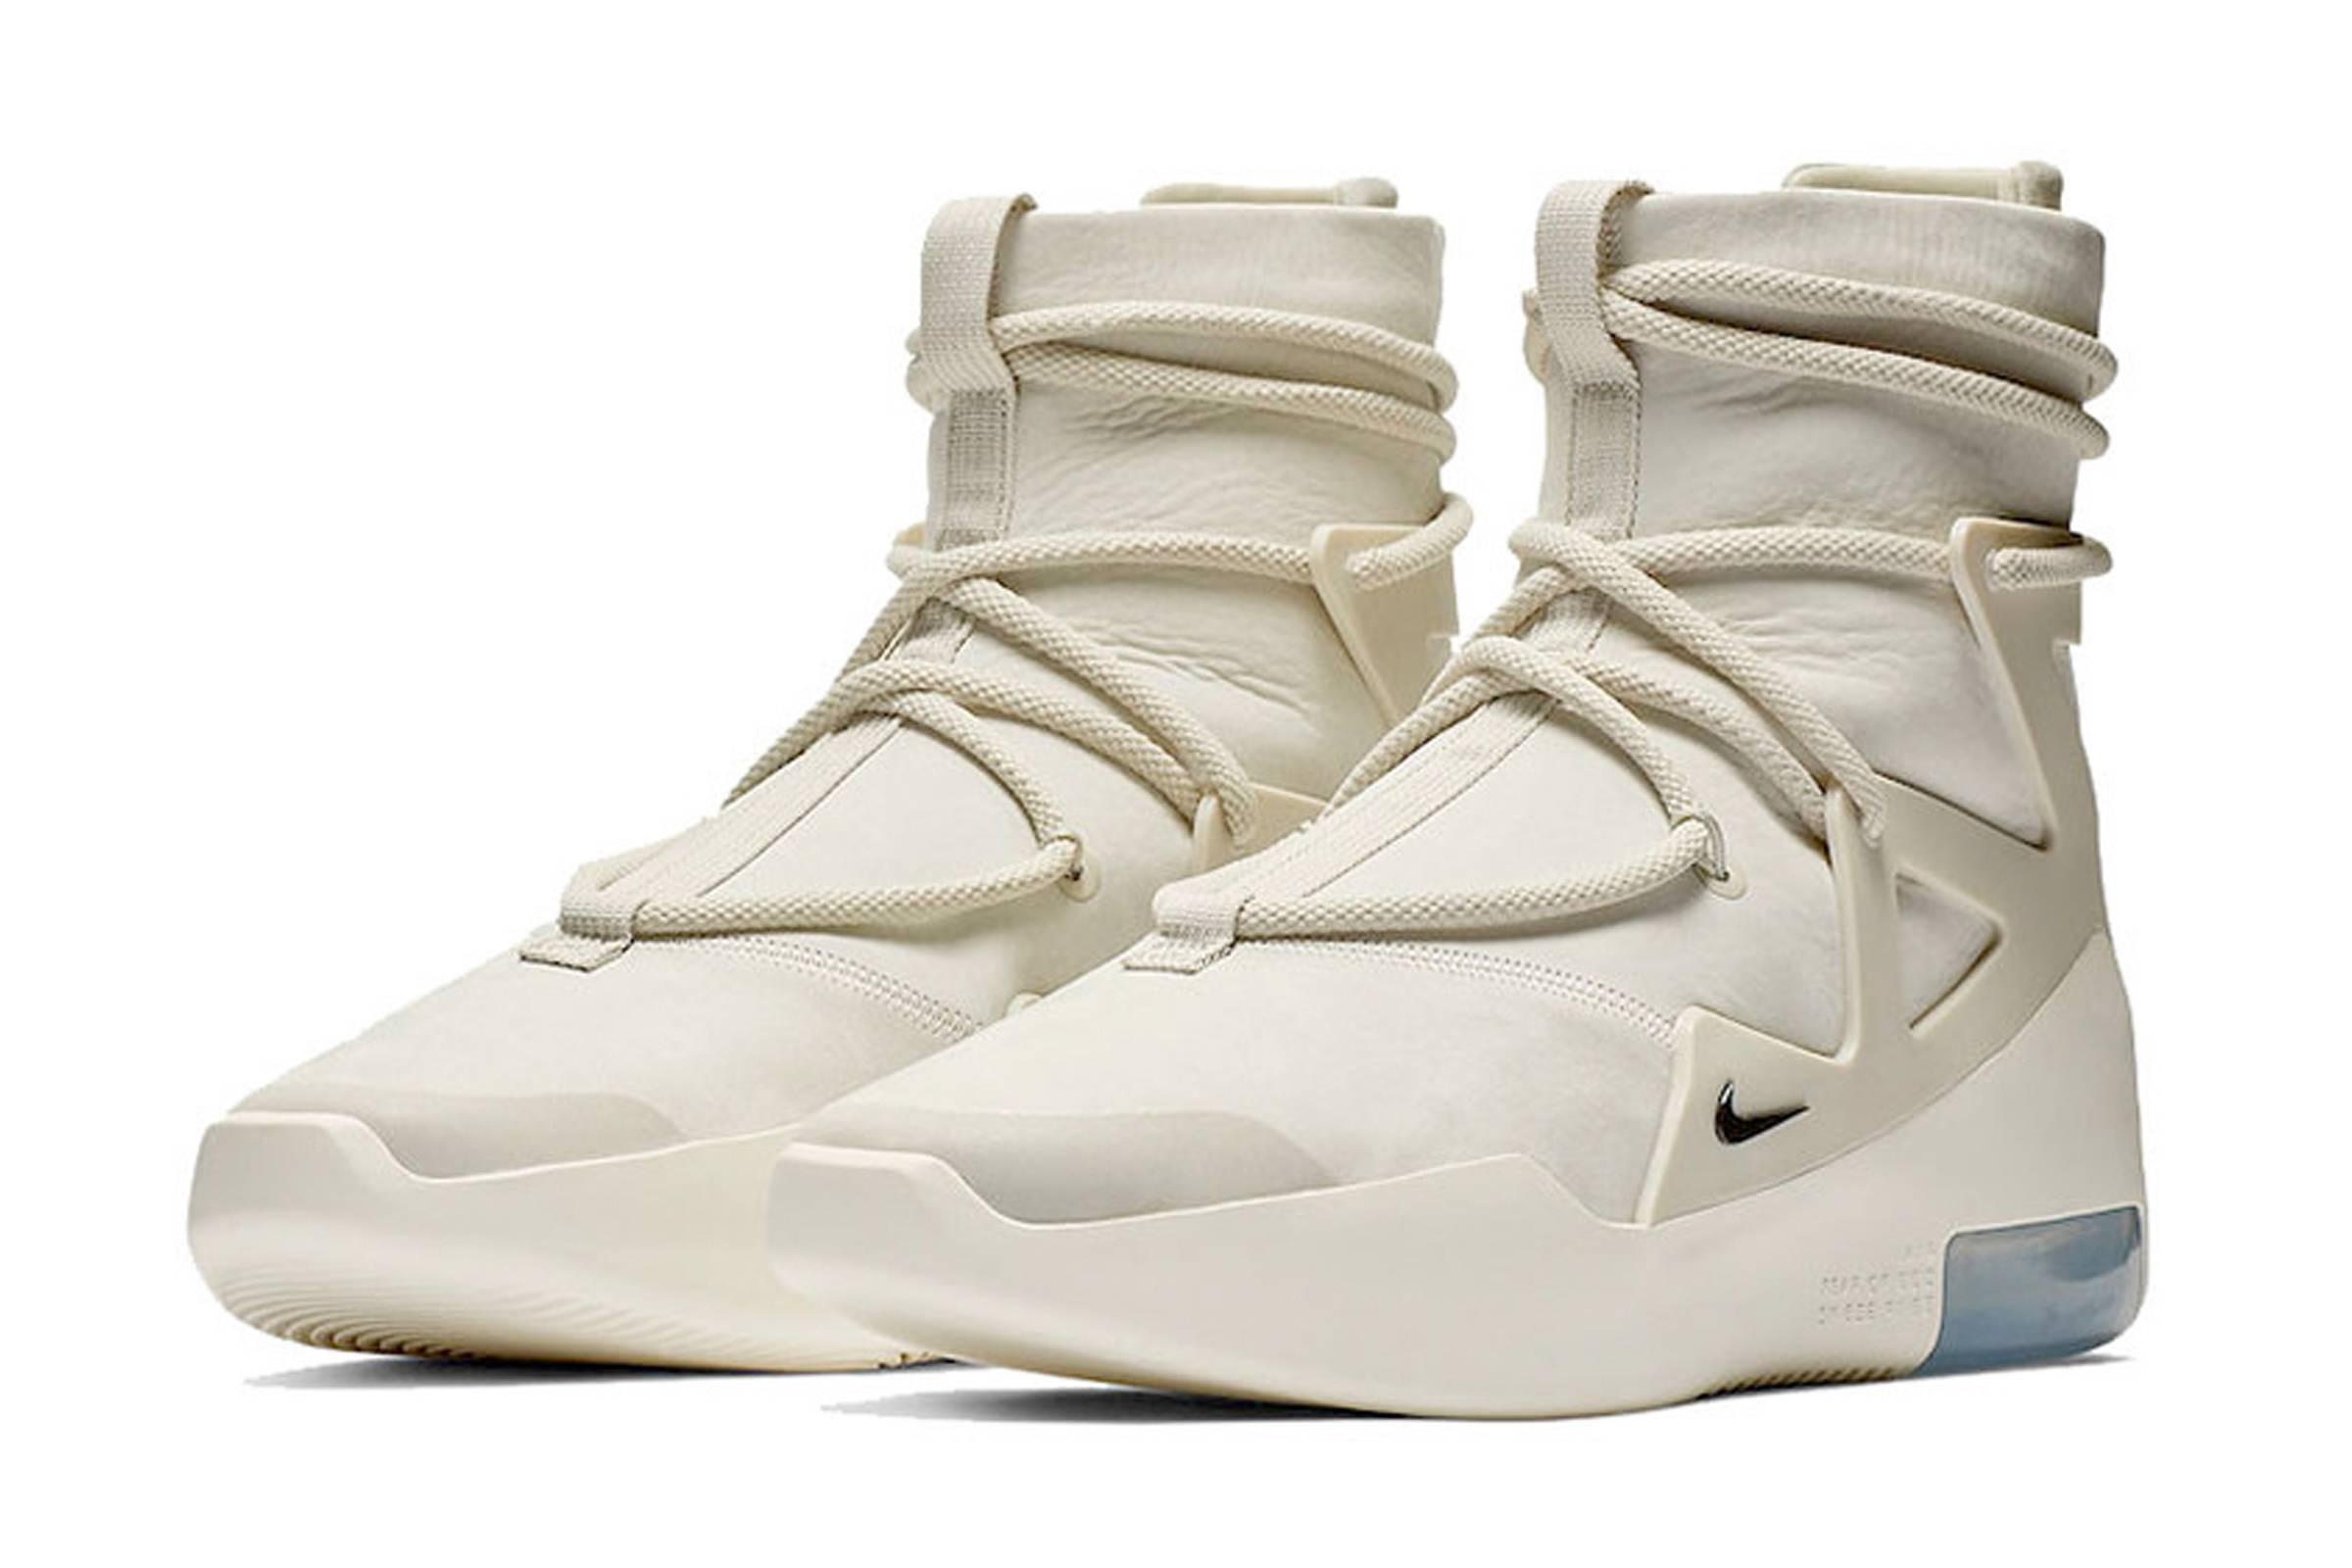 9a250f04edfd The Nike Air Fear of God 1 Drops in Light Bone January 12 - Nike Air ...